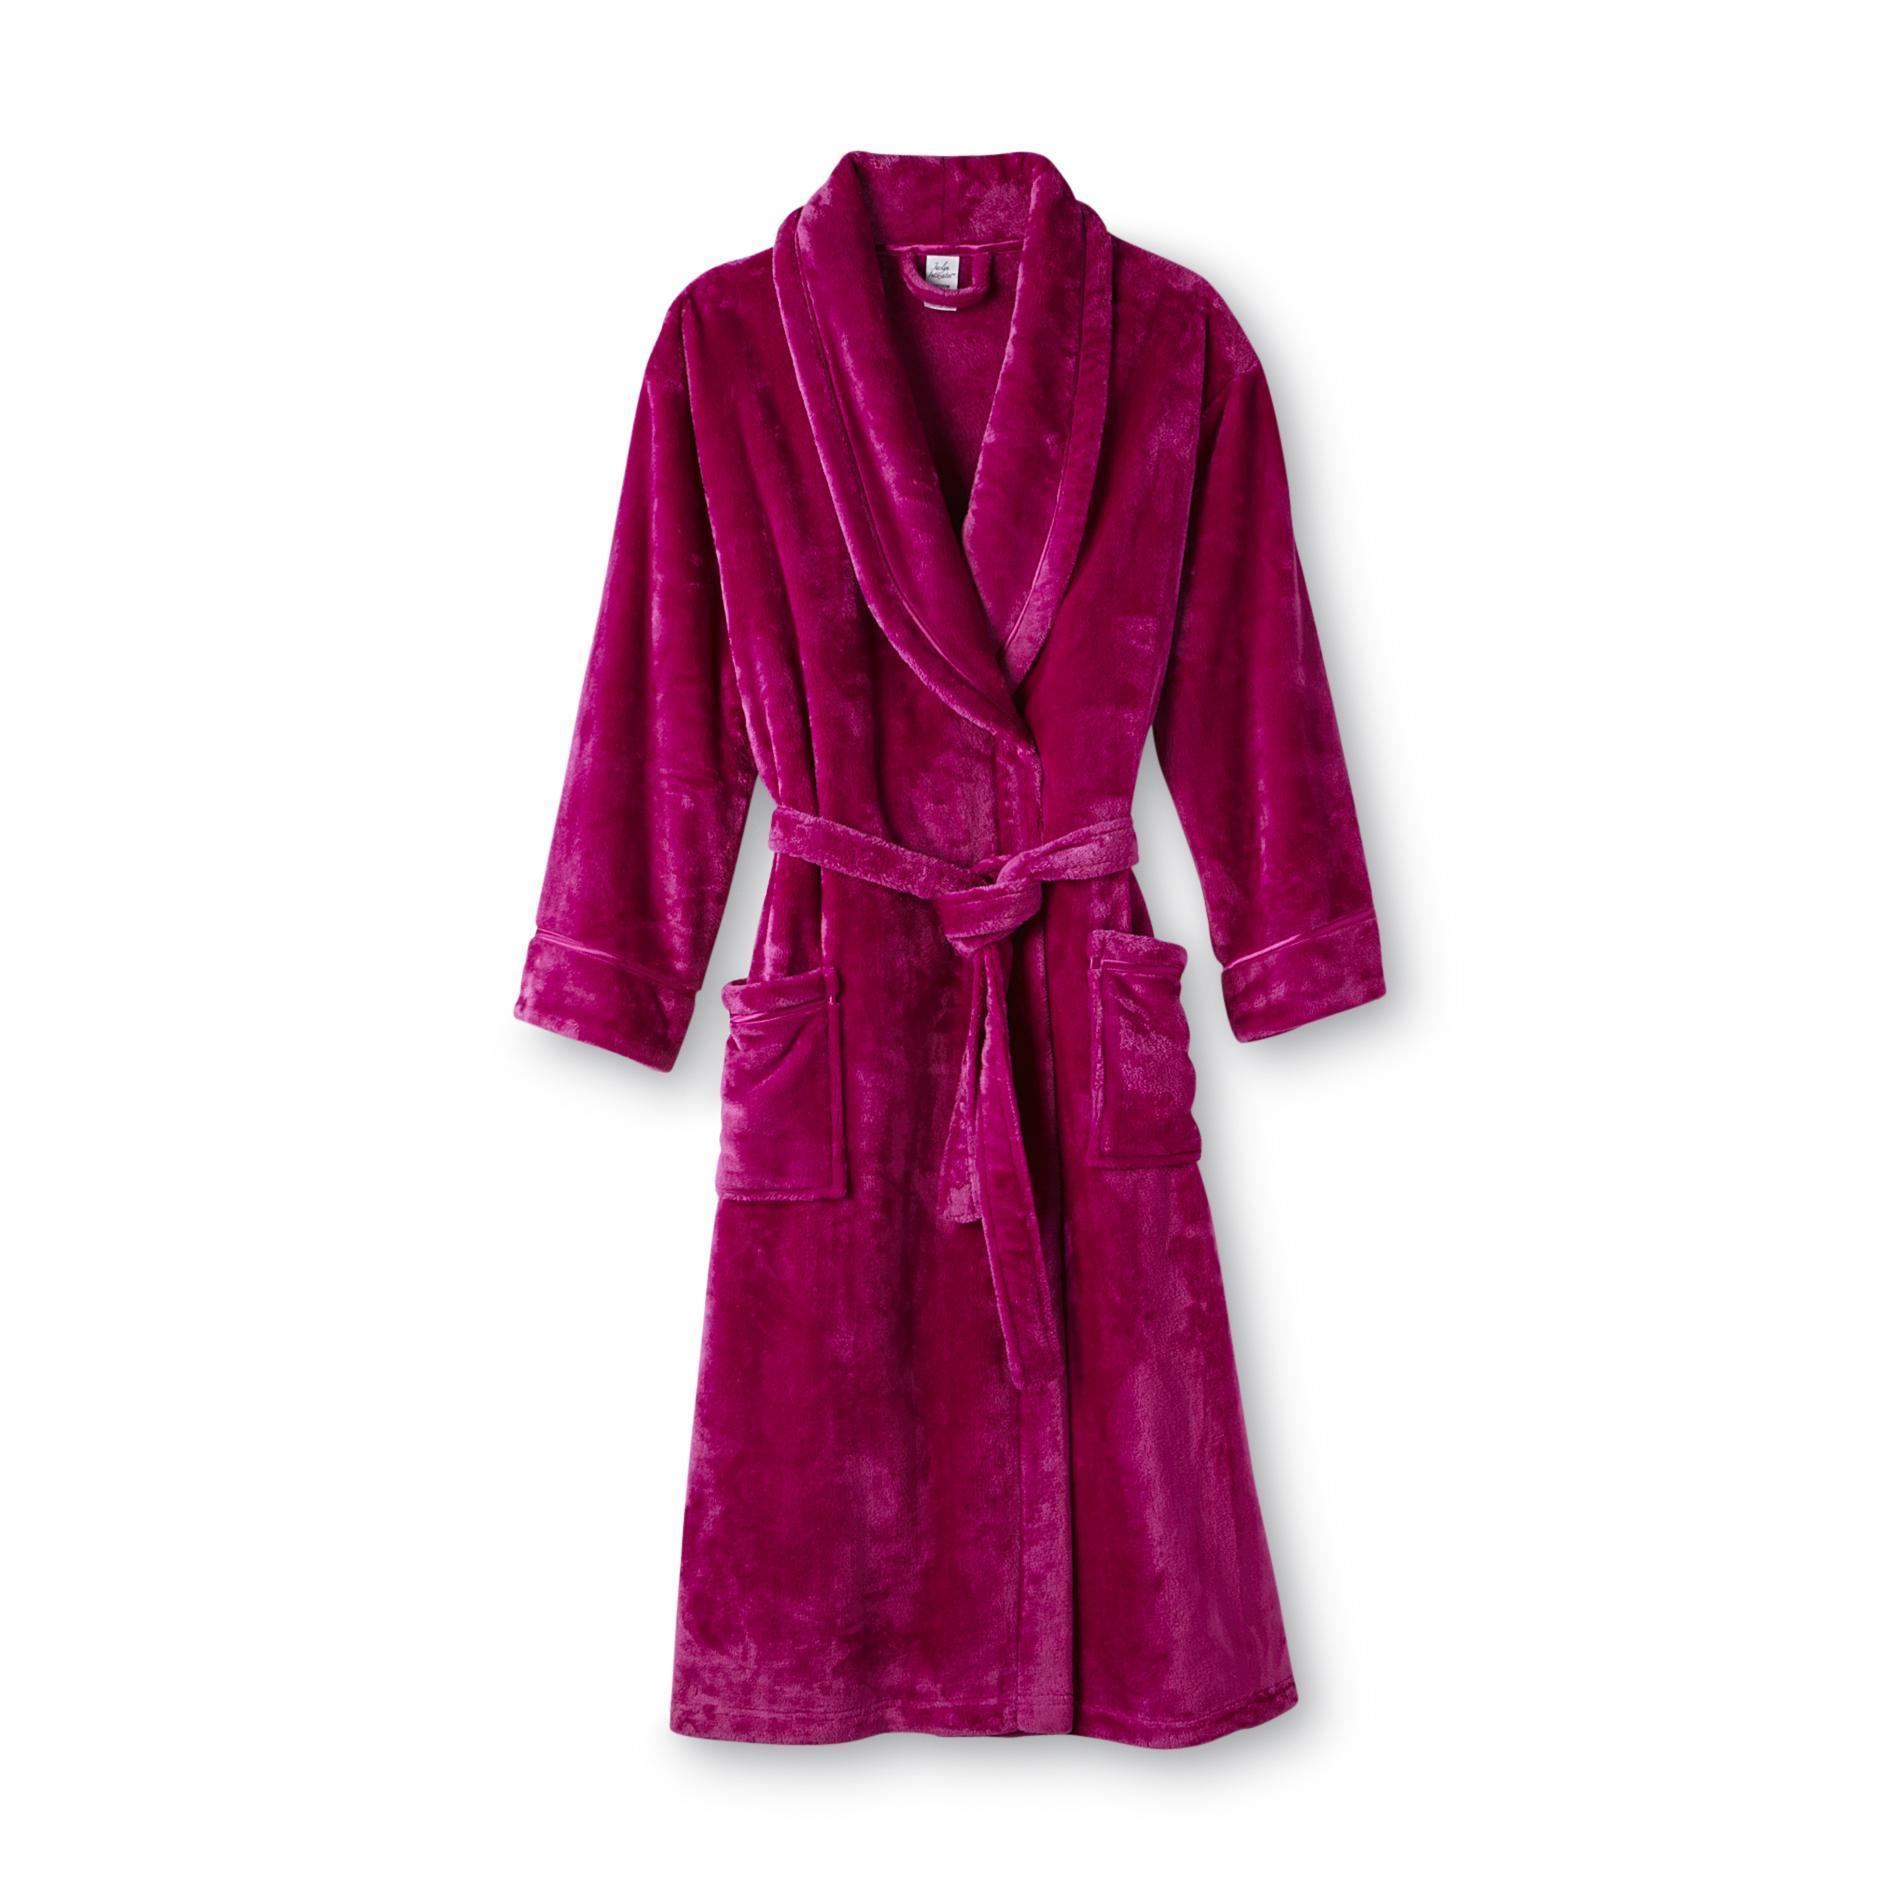 Jaclyn Intimates Women' Ultra Plush Robe